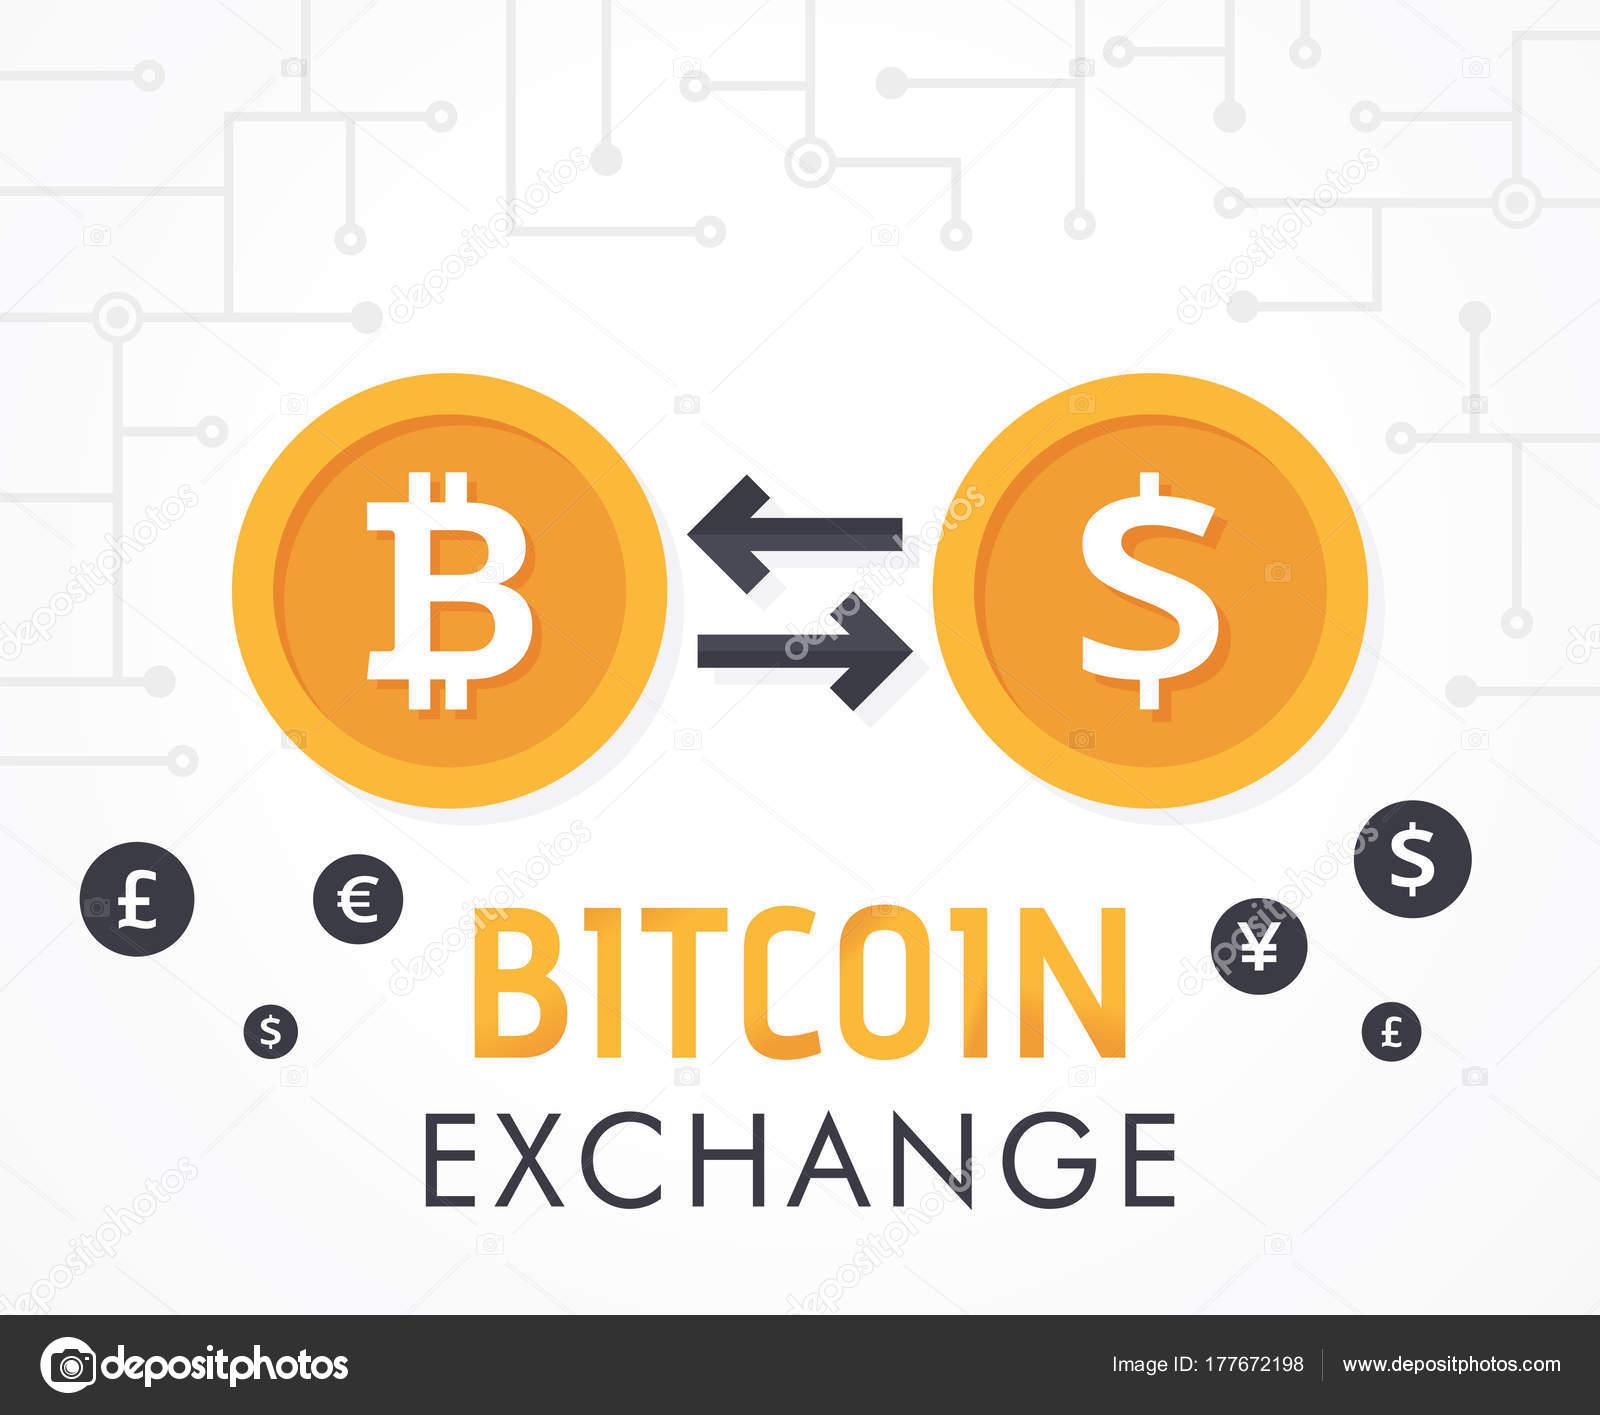 Биржа обмена валют биткоин mw форекс